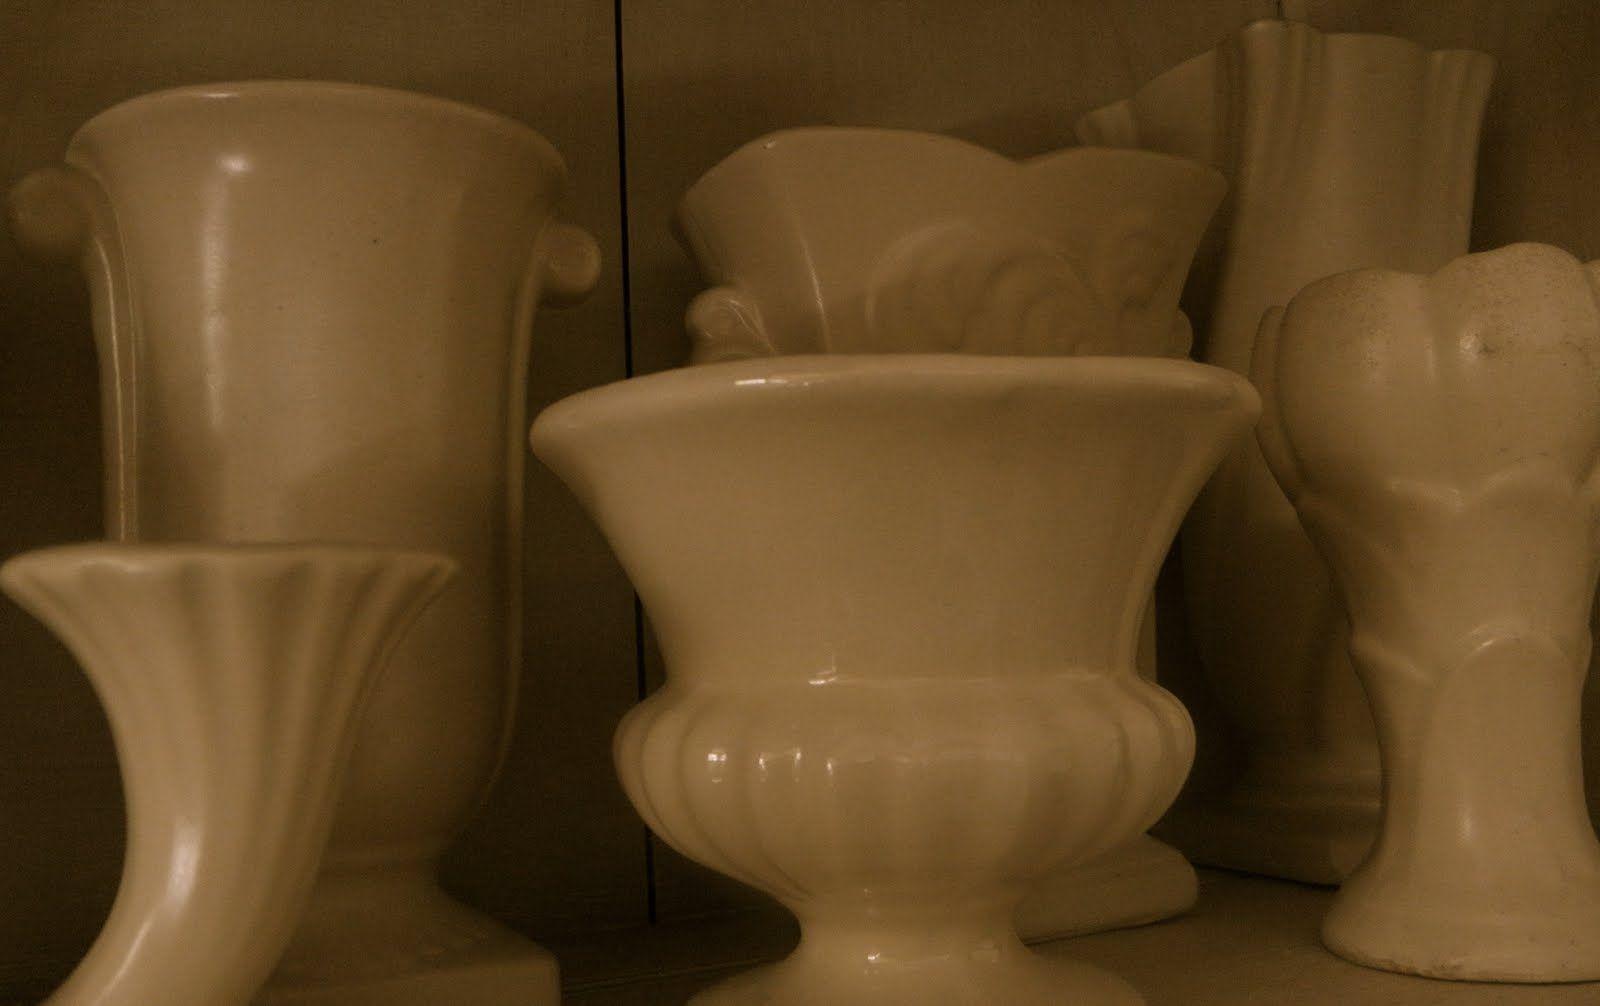 White vases mccoy fiestaware vintage pottery pinterest white vases floridaeventfo Choice Image